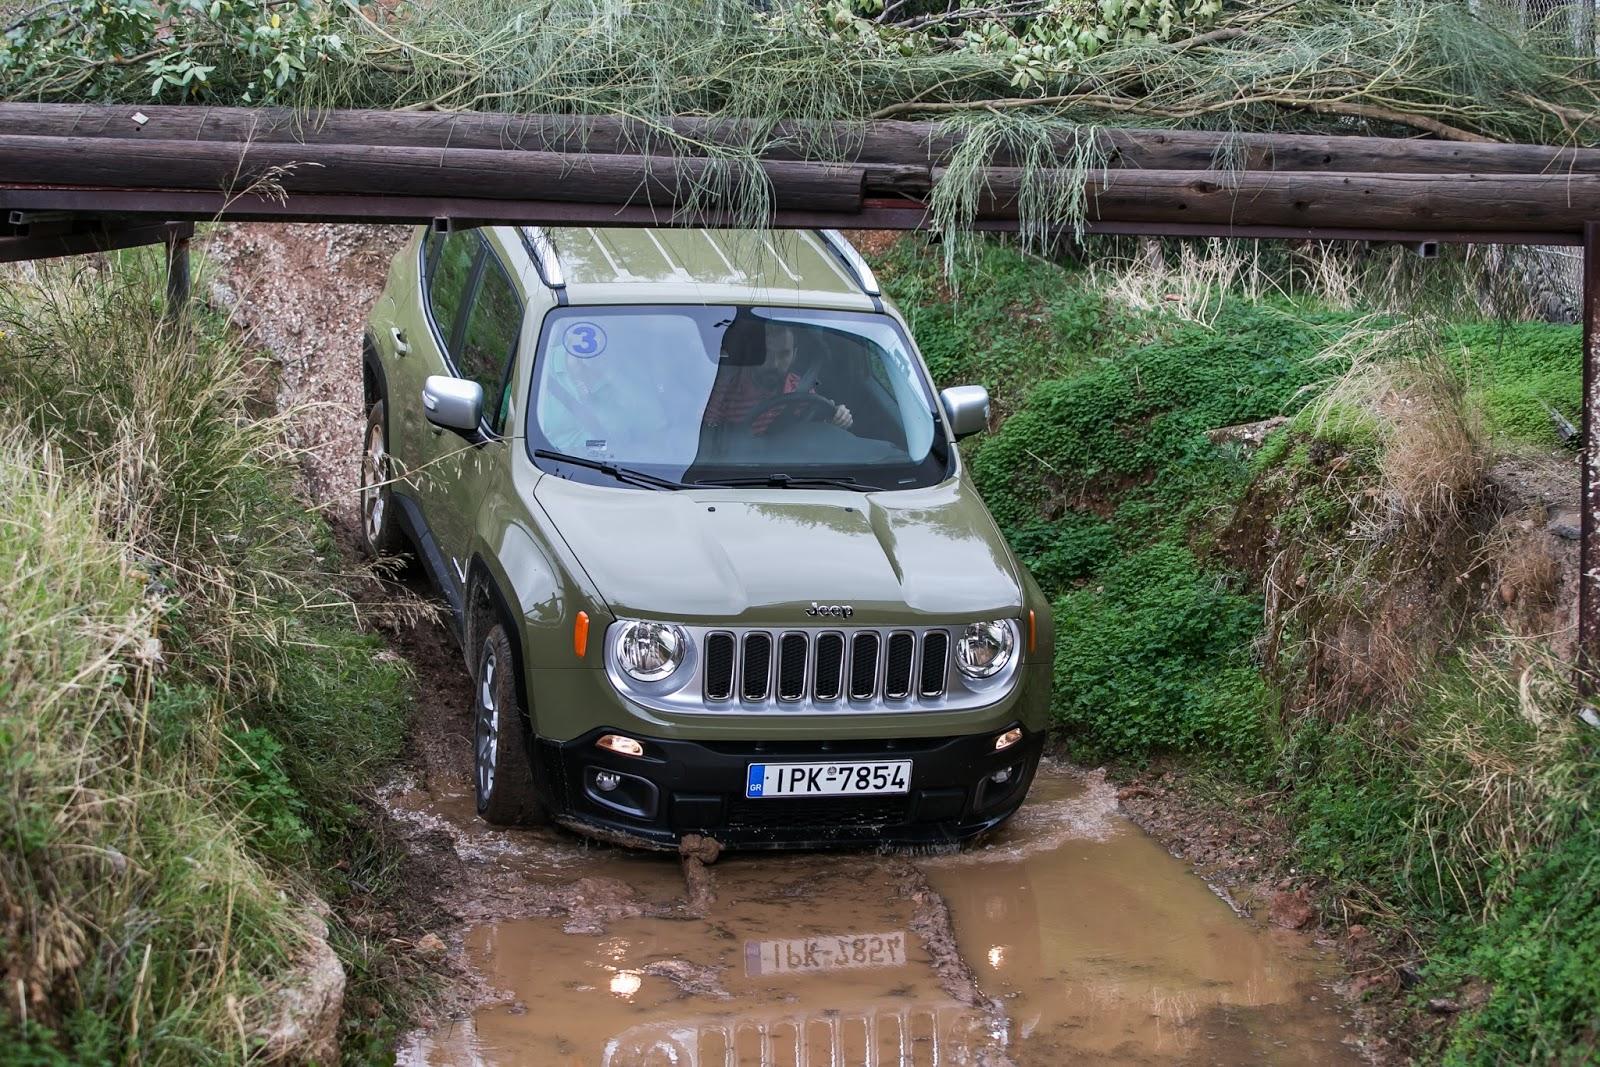 KF 1539 Πετάμε ένα Jeep Renegade σε λάσπες, πέτρες, άμμο, λίμνες. Θα τα καταφέρει; Jeep, Jeep Renegade, Renegade, SUV, TEST, zblog, ΔΟΚΙΜΕΣ